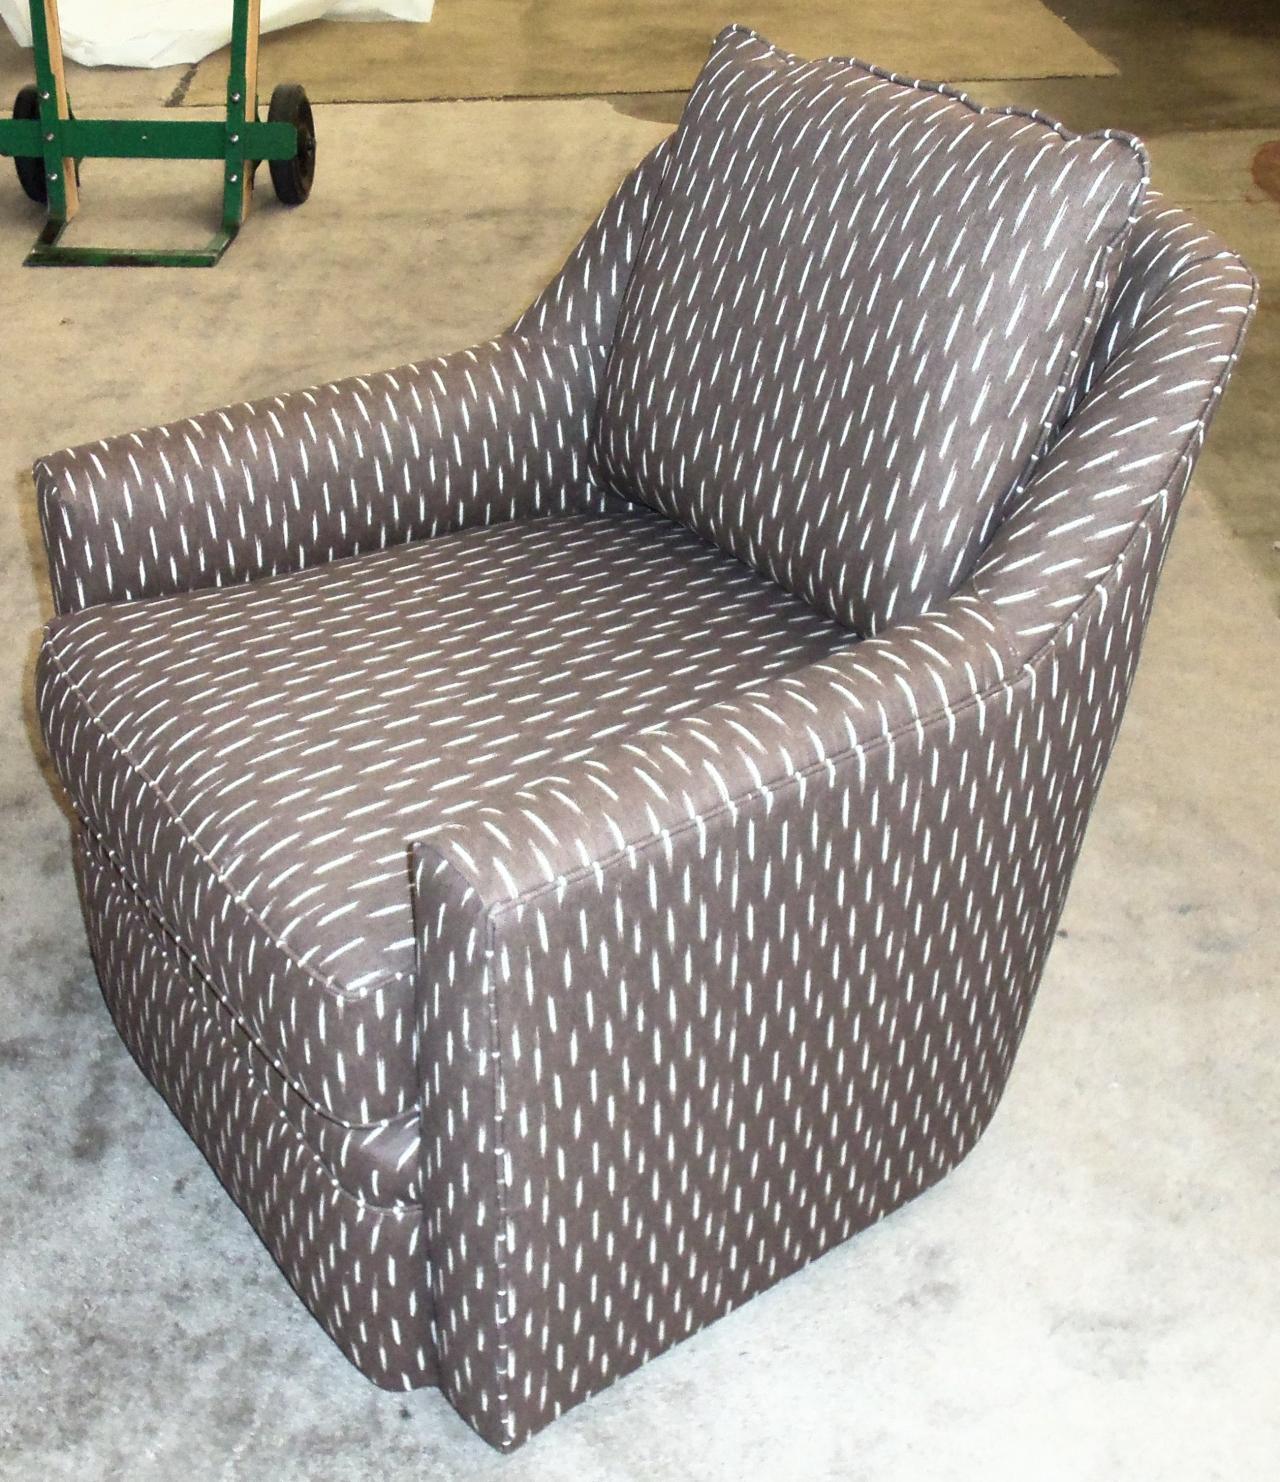 Barnett Furniture Rowe furnitureHollins swivel chair